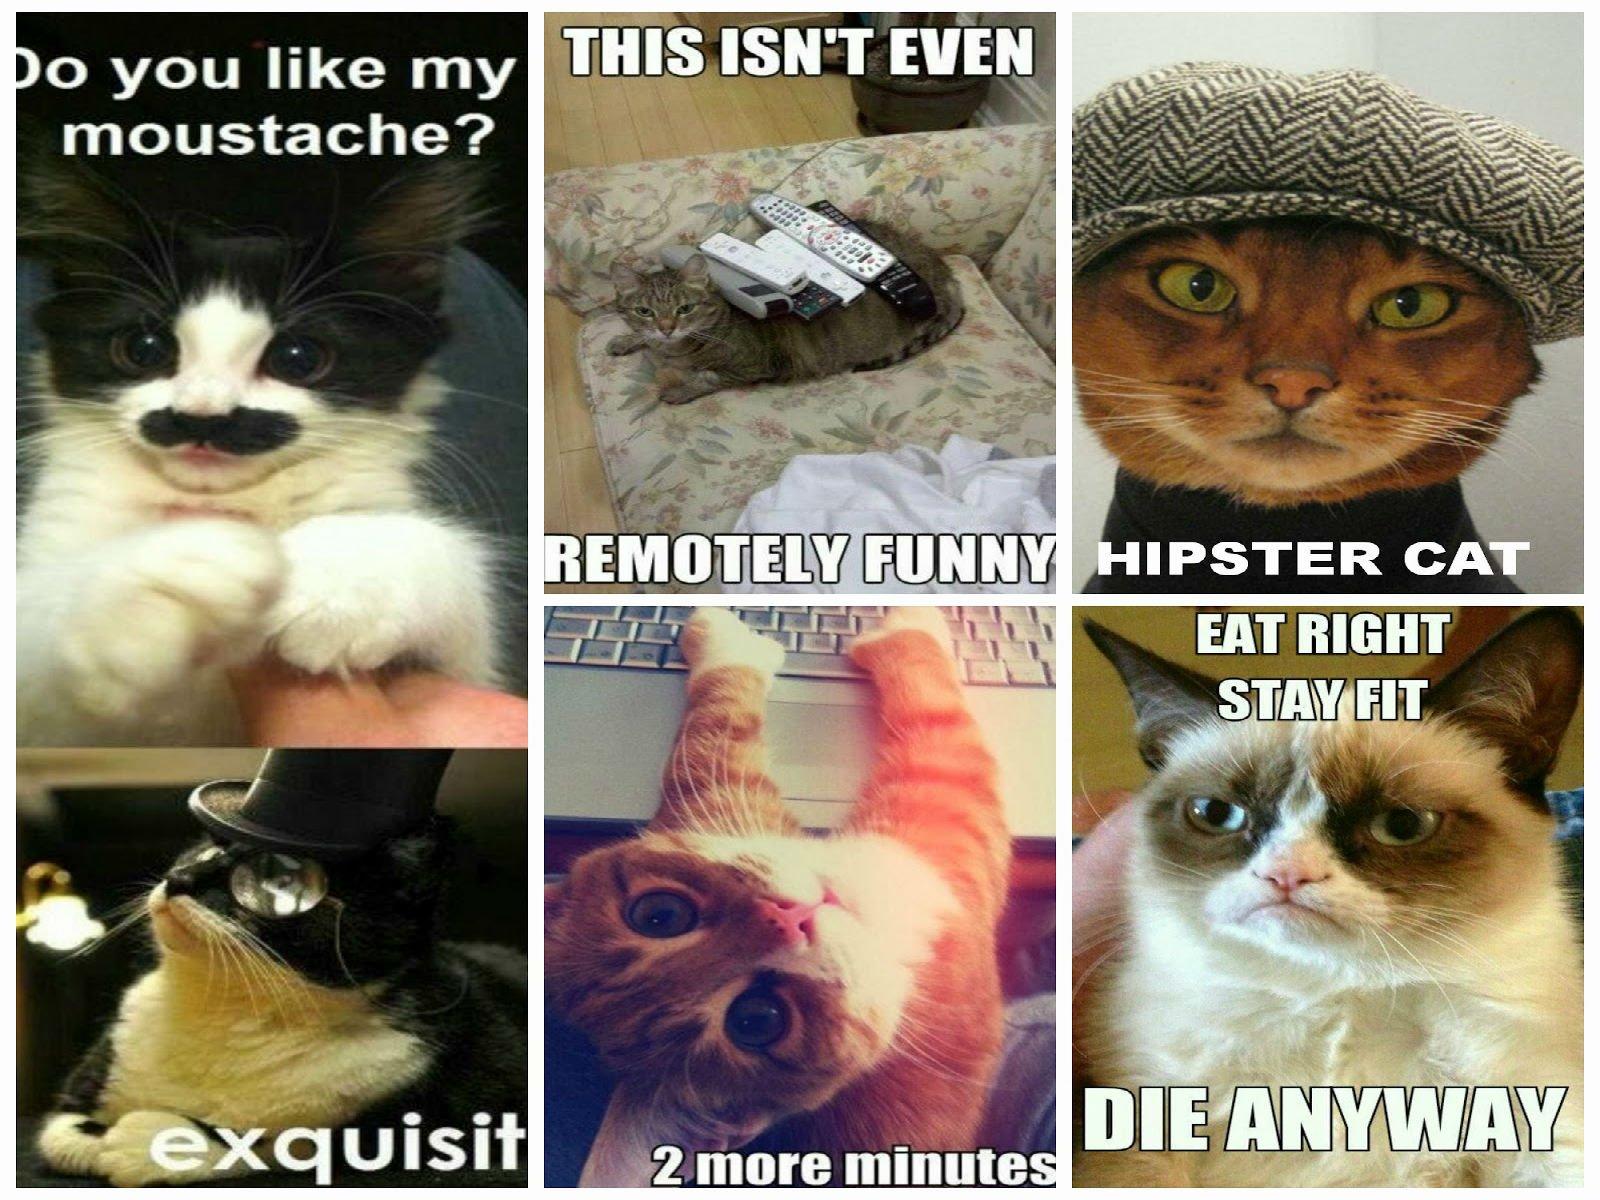 cat meme quote funny humor grumpy 92 wallpaper 1600x1200 355181